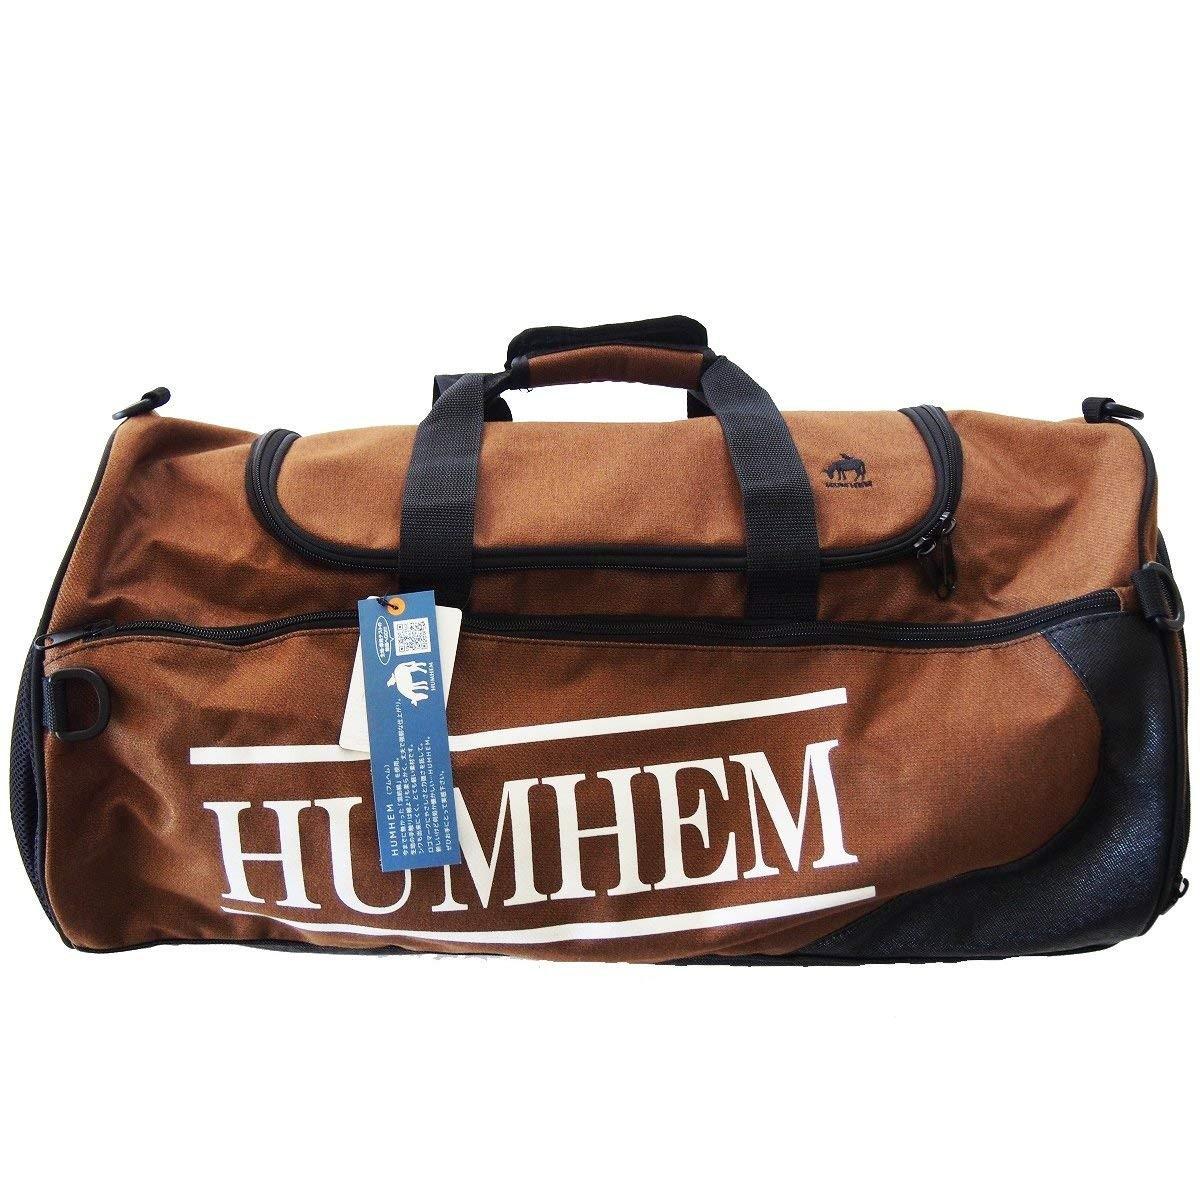 KH HUMHEM ボストンバッグ ブラウン【クーポン配布中】